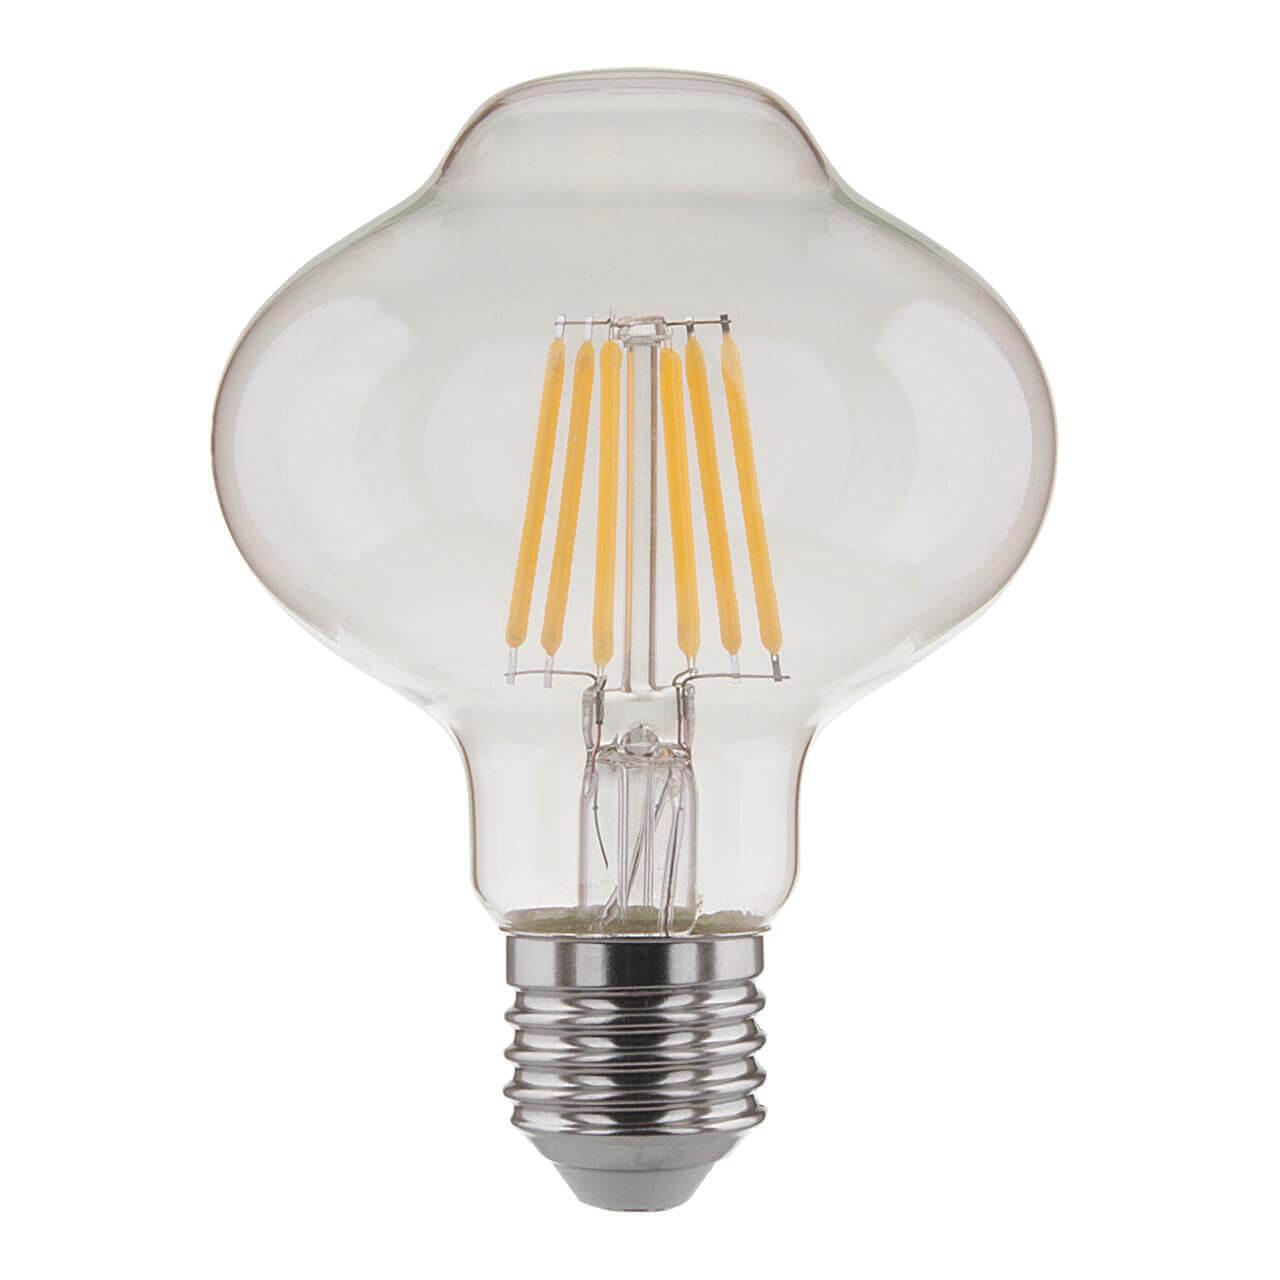 Лампа светодиодная филаментная E27 10W 4200K прозрачная 4690389125218 elektrostandard dss002 10w 4200k